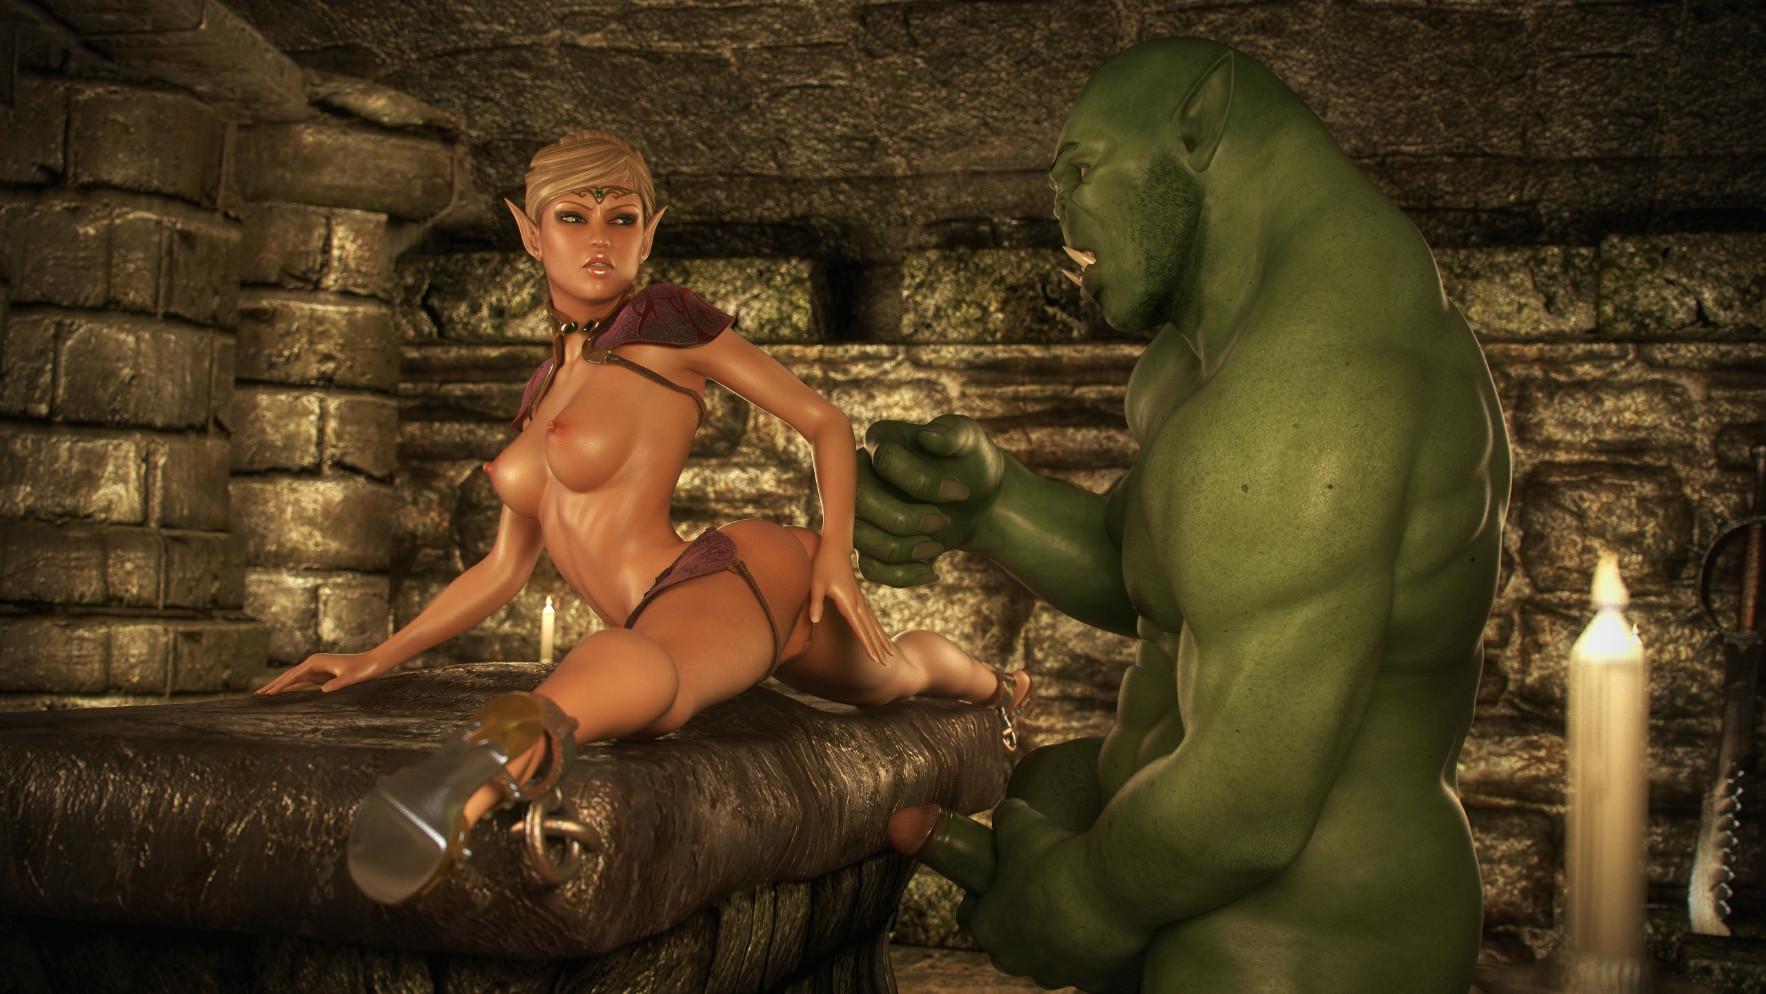 Free Online Monster Porn